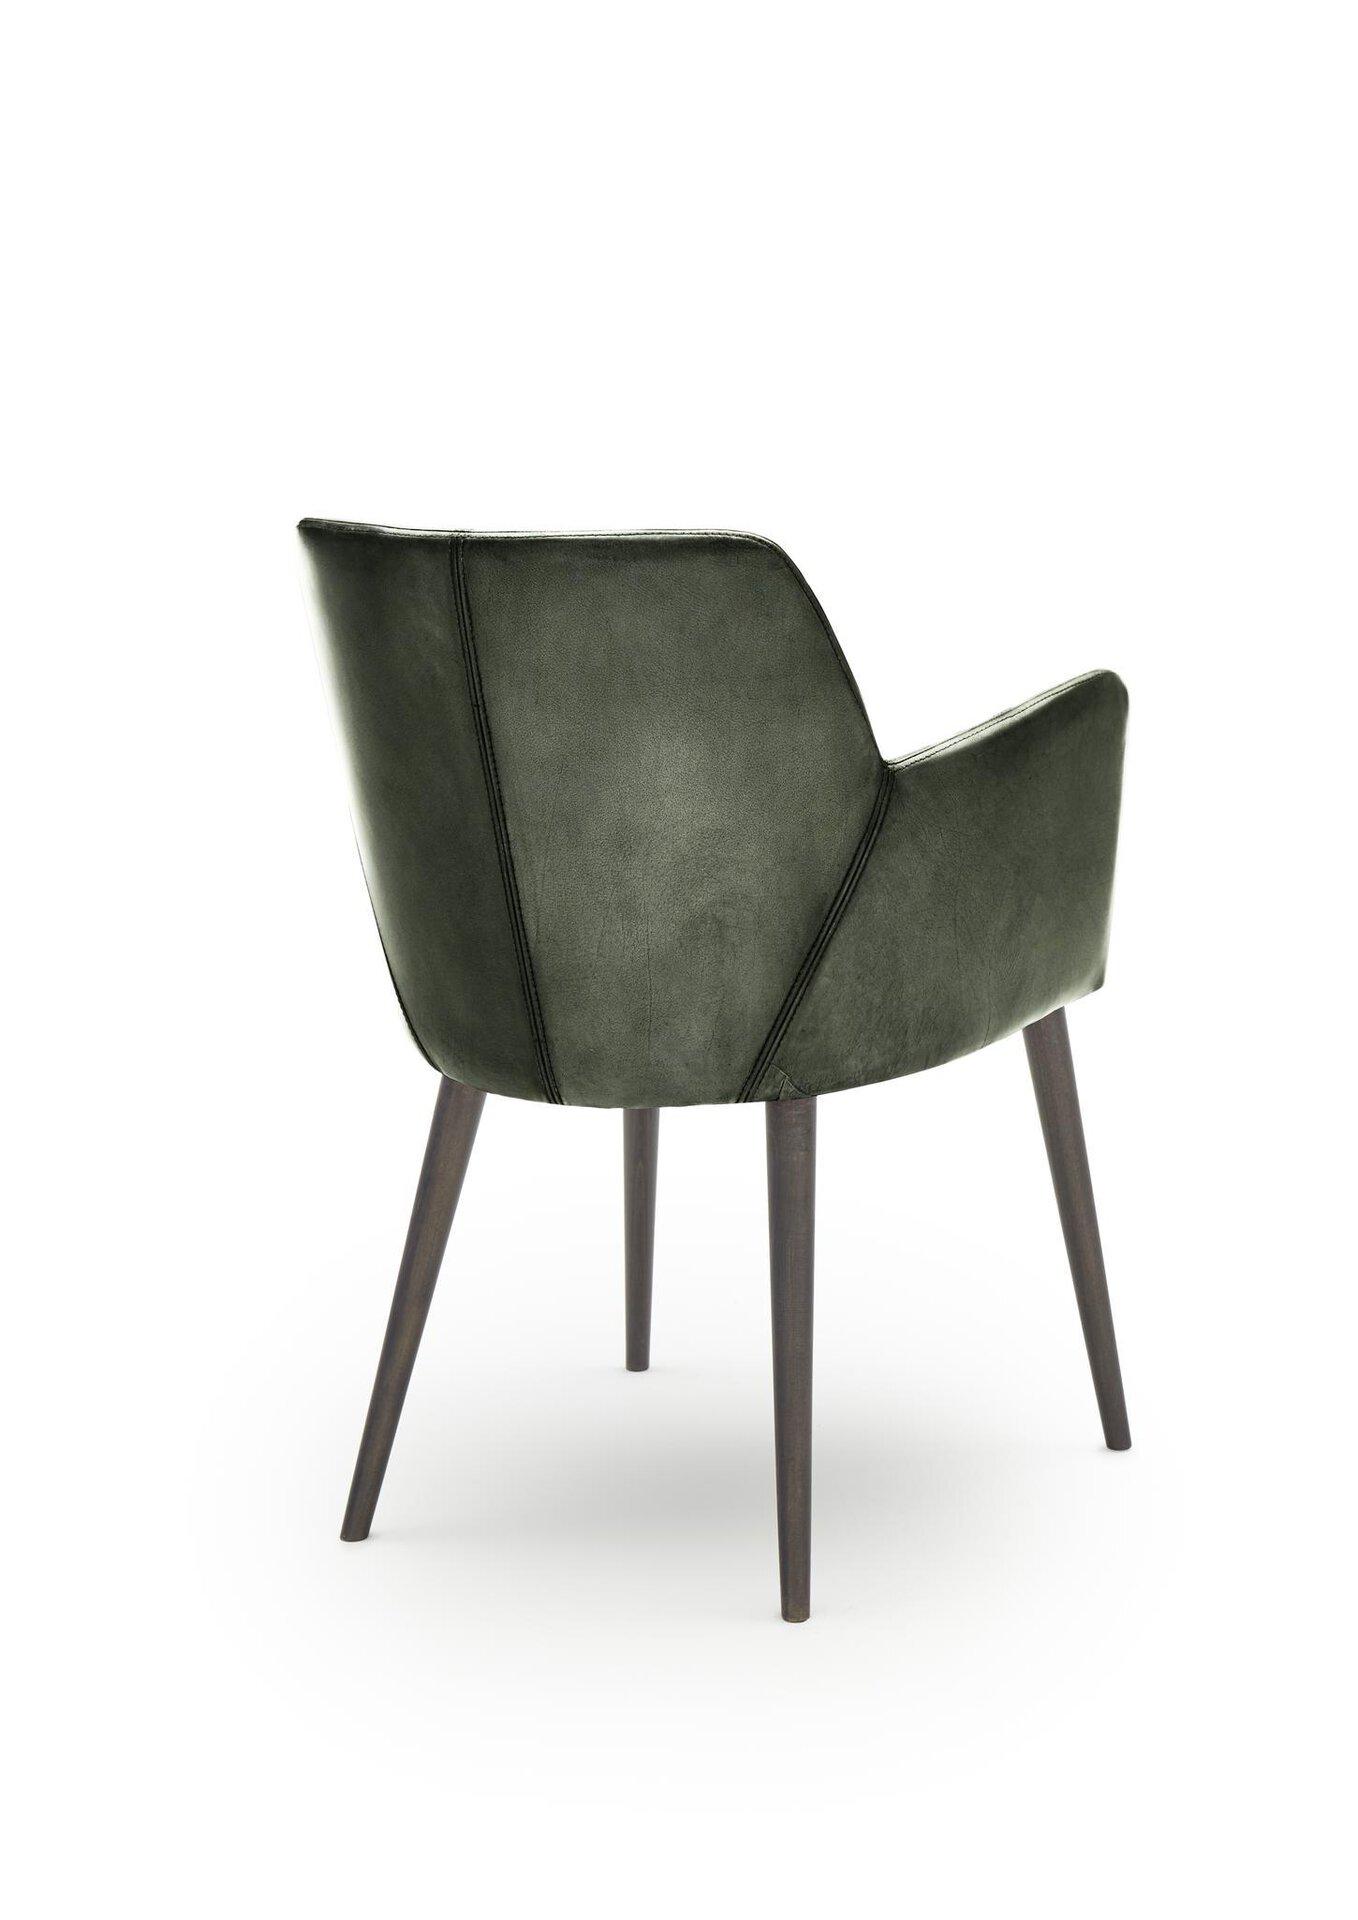 4-Fuß-Stuhl WK7005 Stuart WK Wohnen Edition Leder grün 57 x 83 x 59 cm